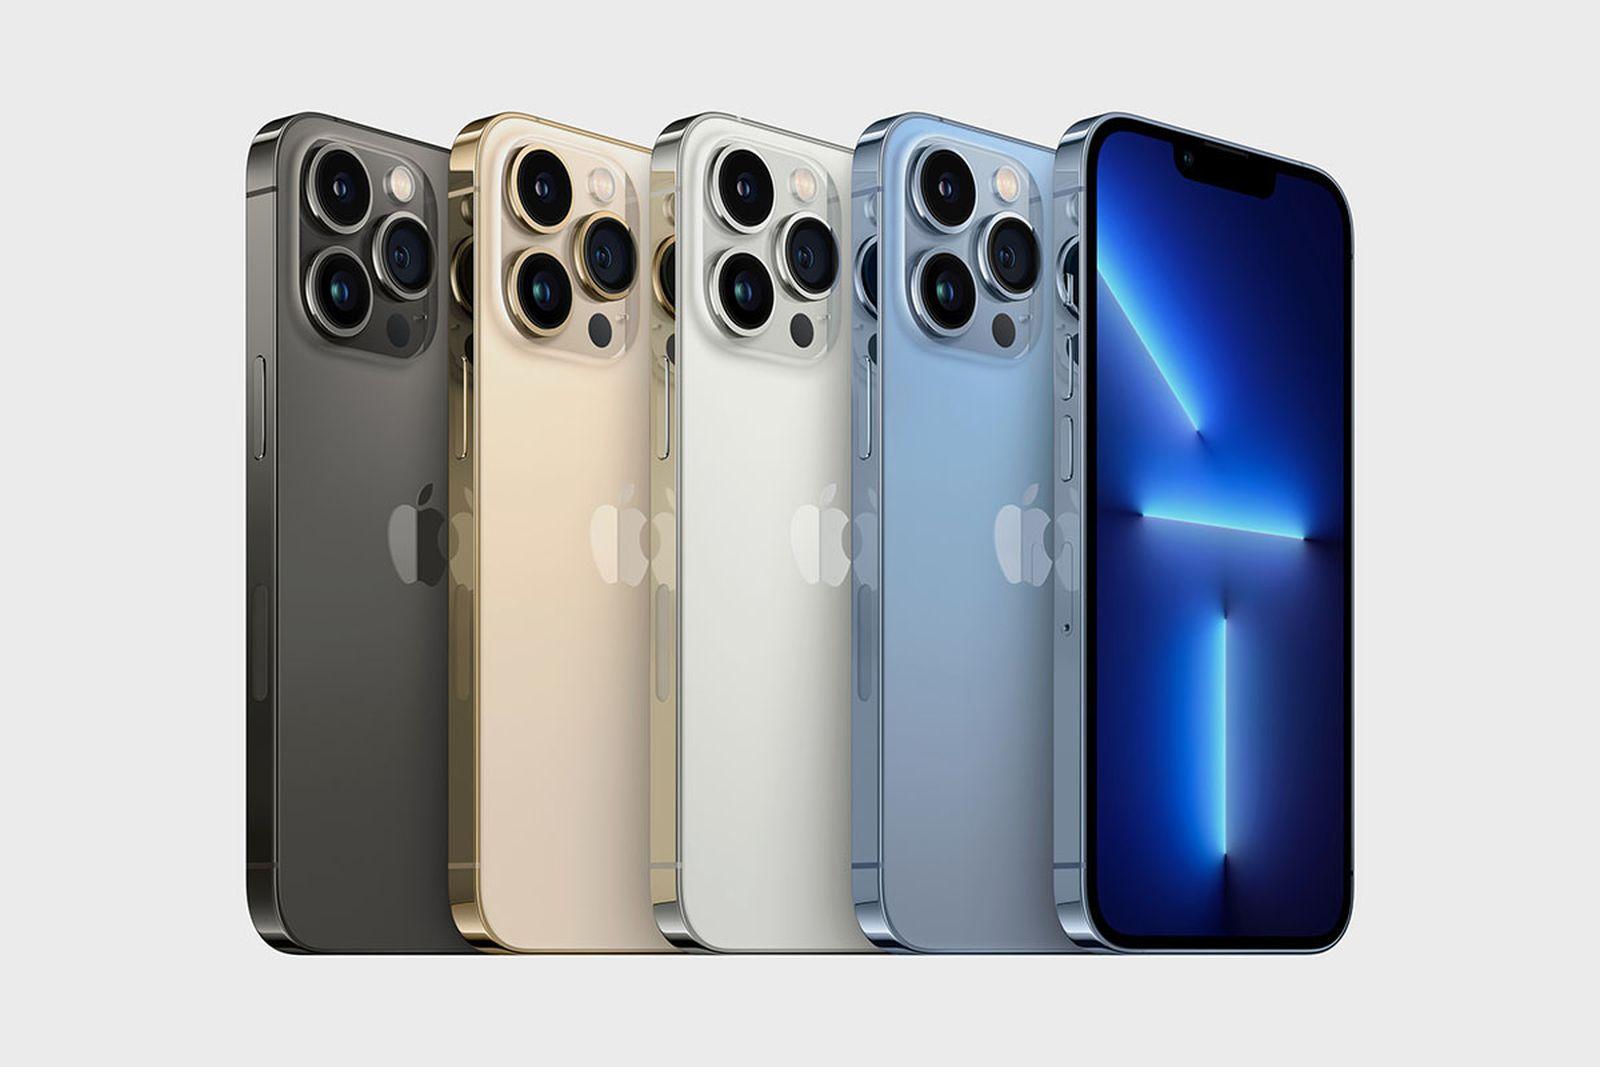 apple-iphone-13-pro-max-05